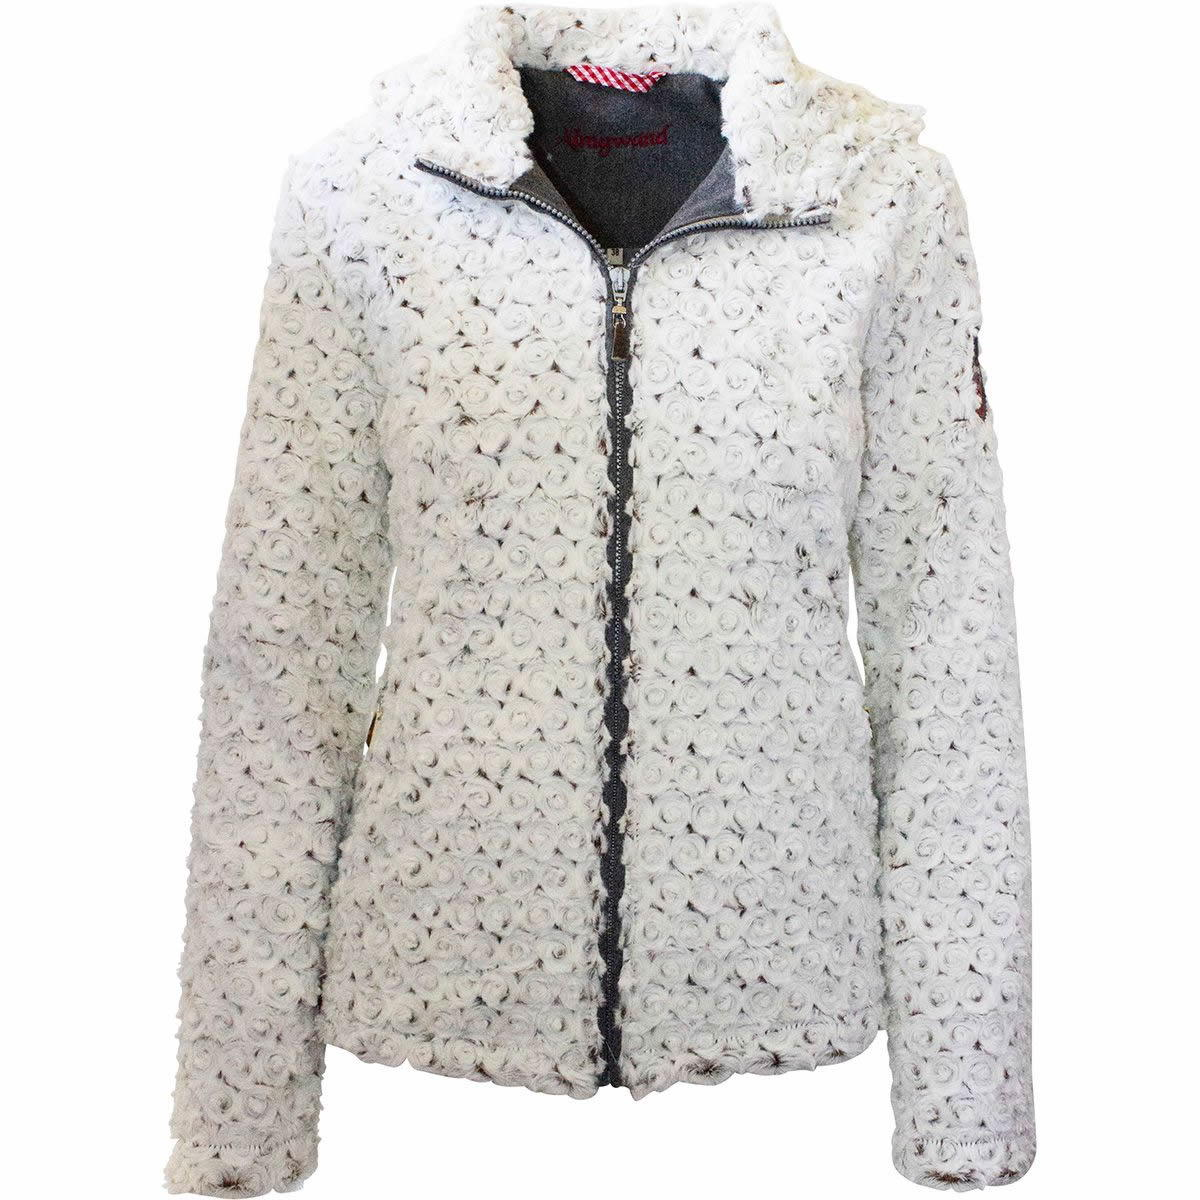 Almgwand Geißspitze Warme Kapuzen-Jacke Damen Übergröße